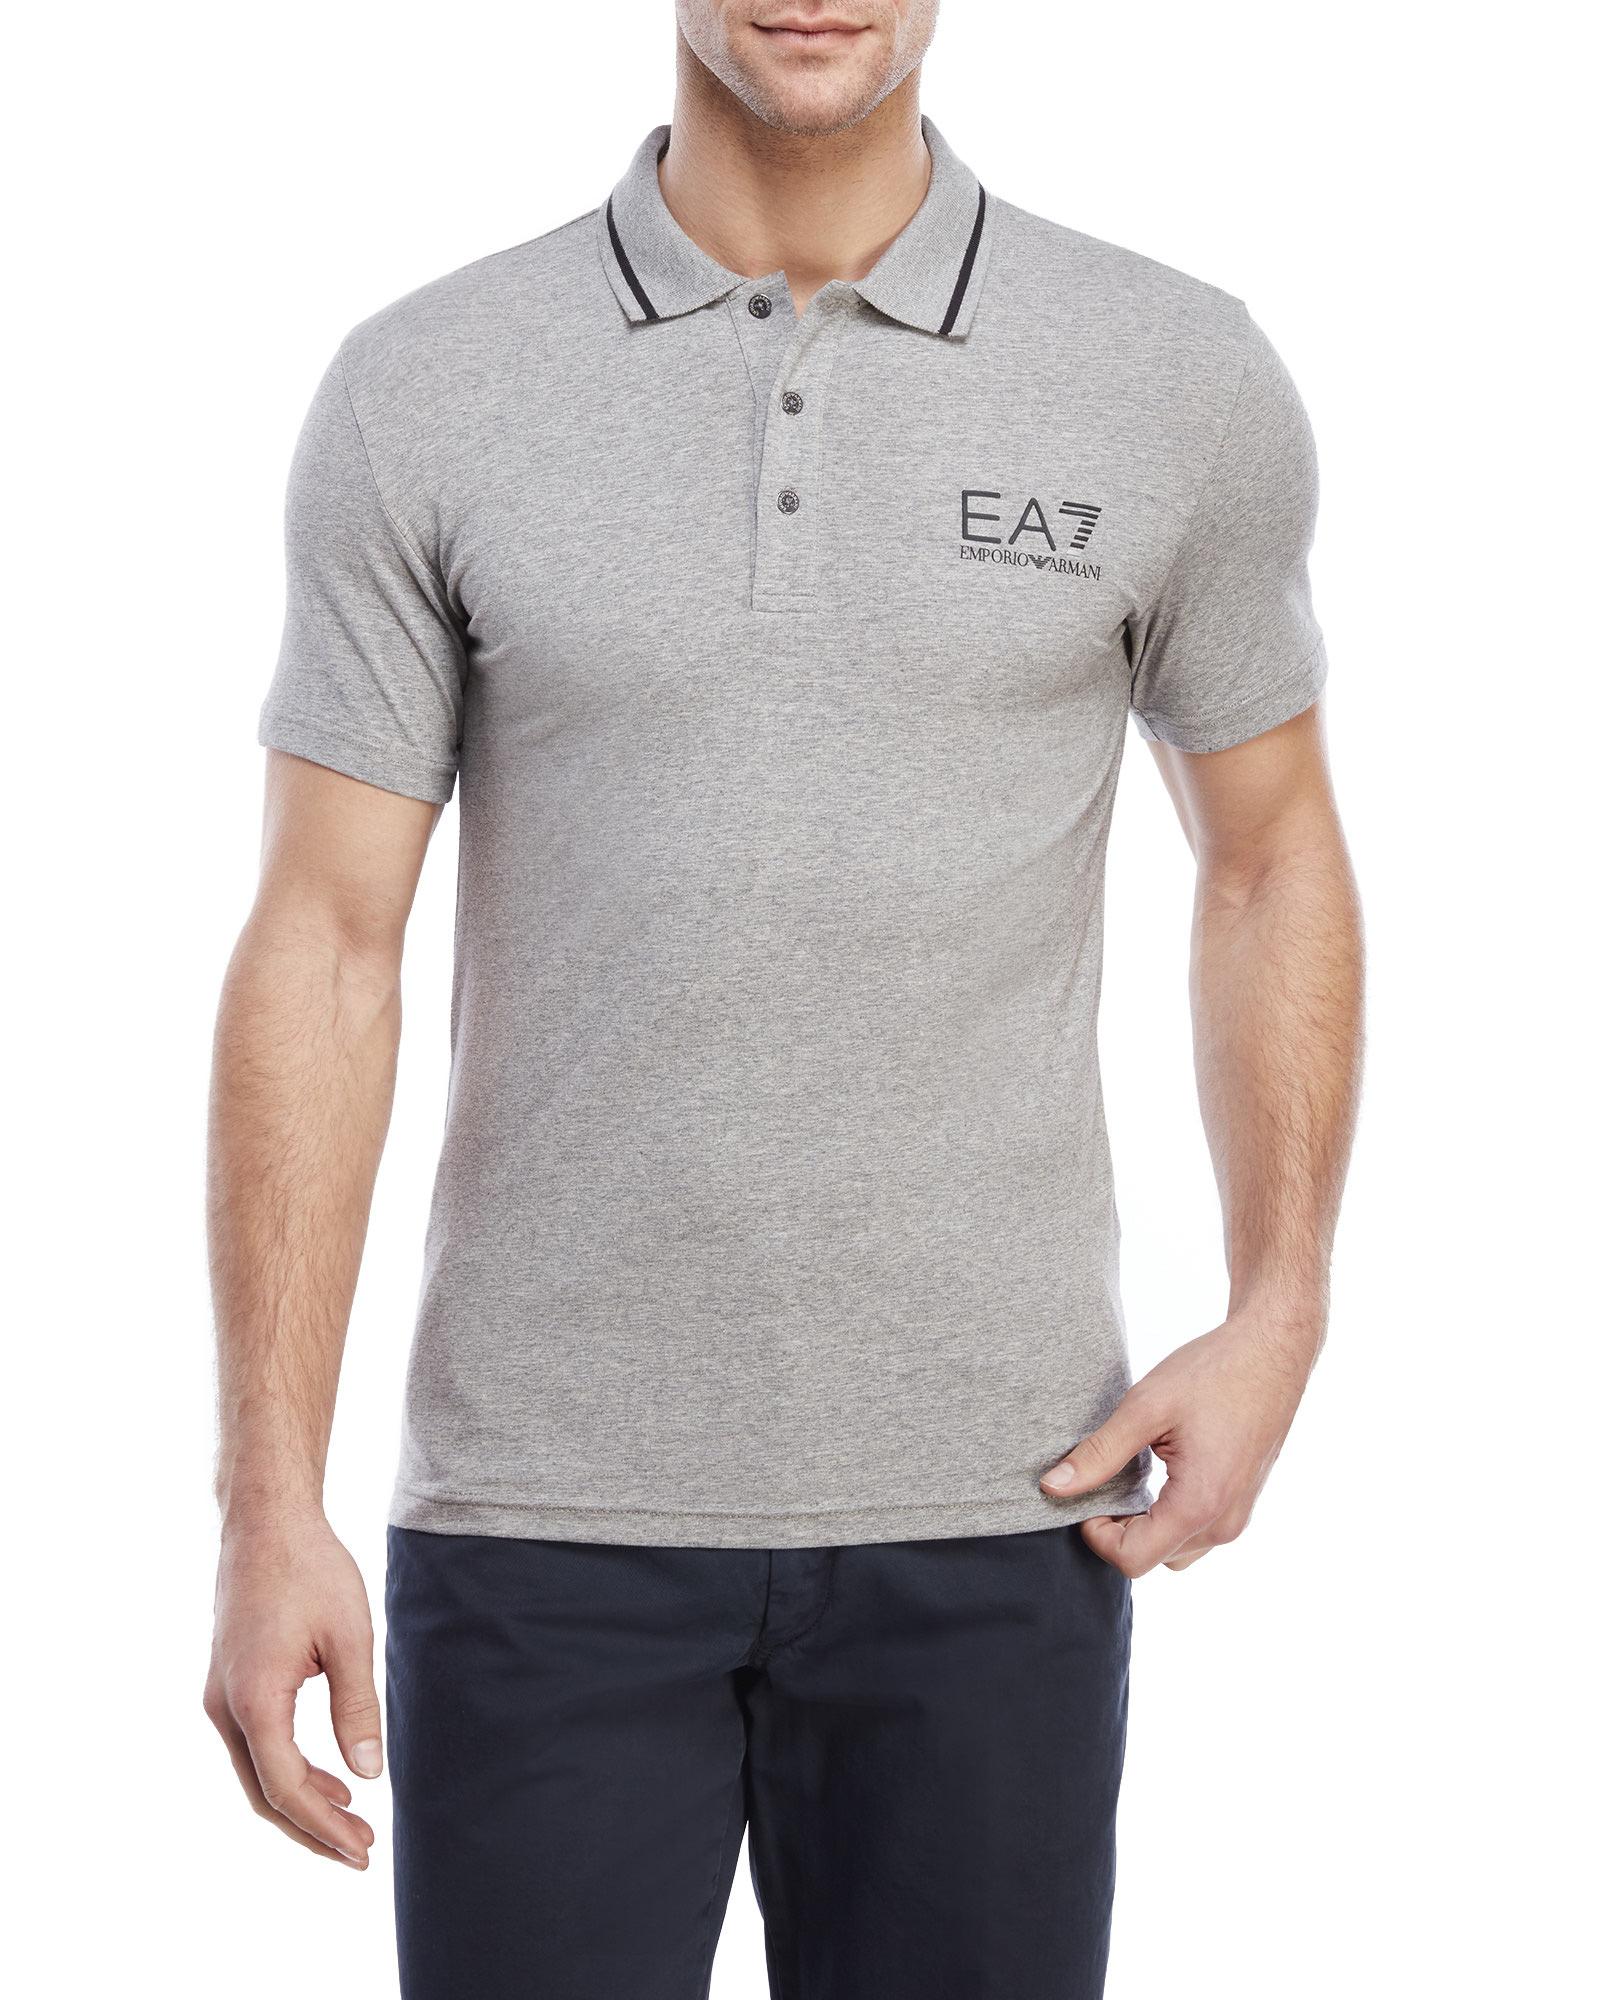 ebd33121 EA7 Medium Grey Train Core Id Polo Shirt in Gray for Men - Lyst